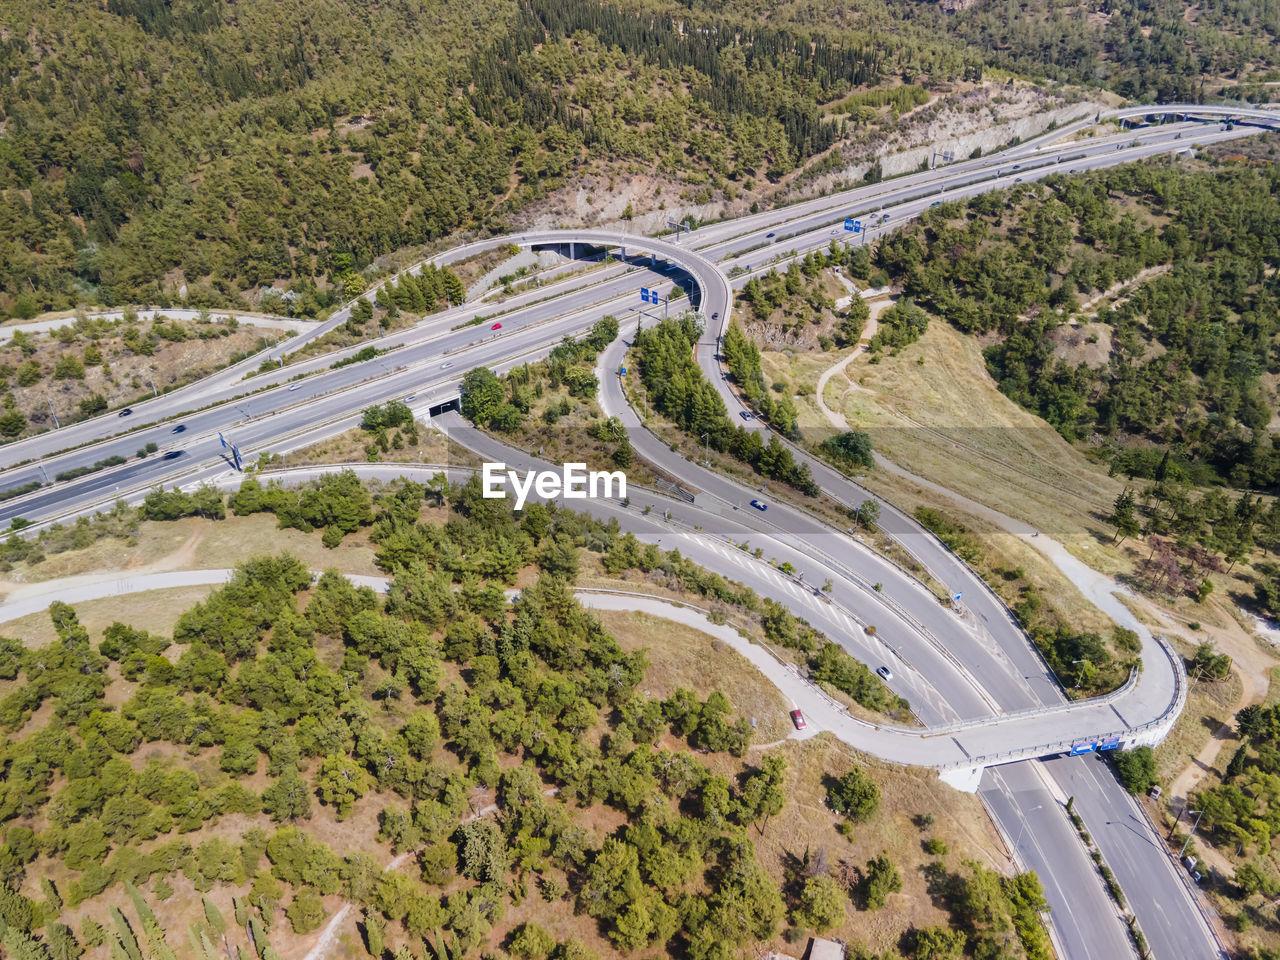 Aerial view of freeway